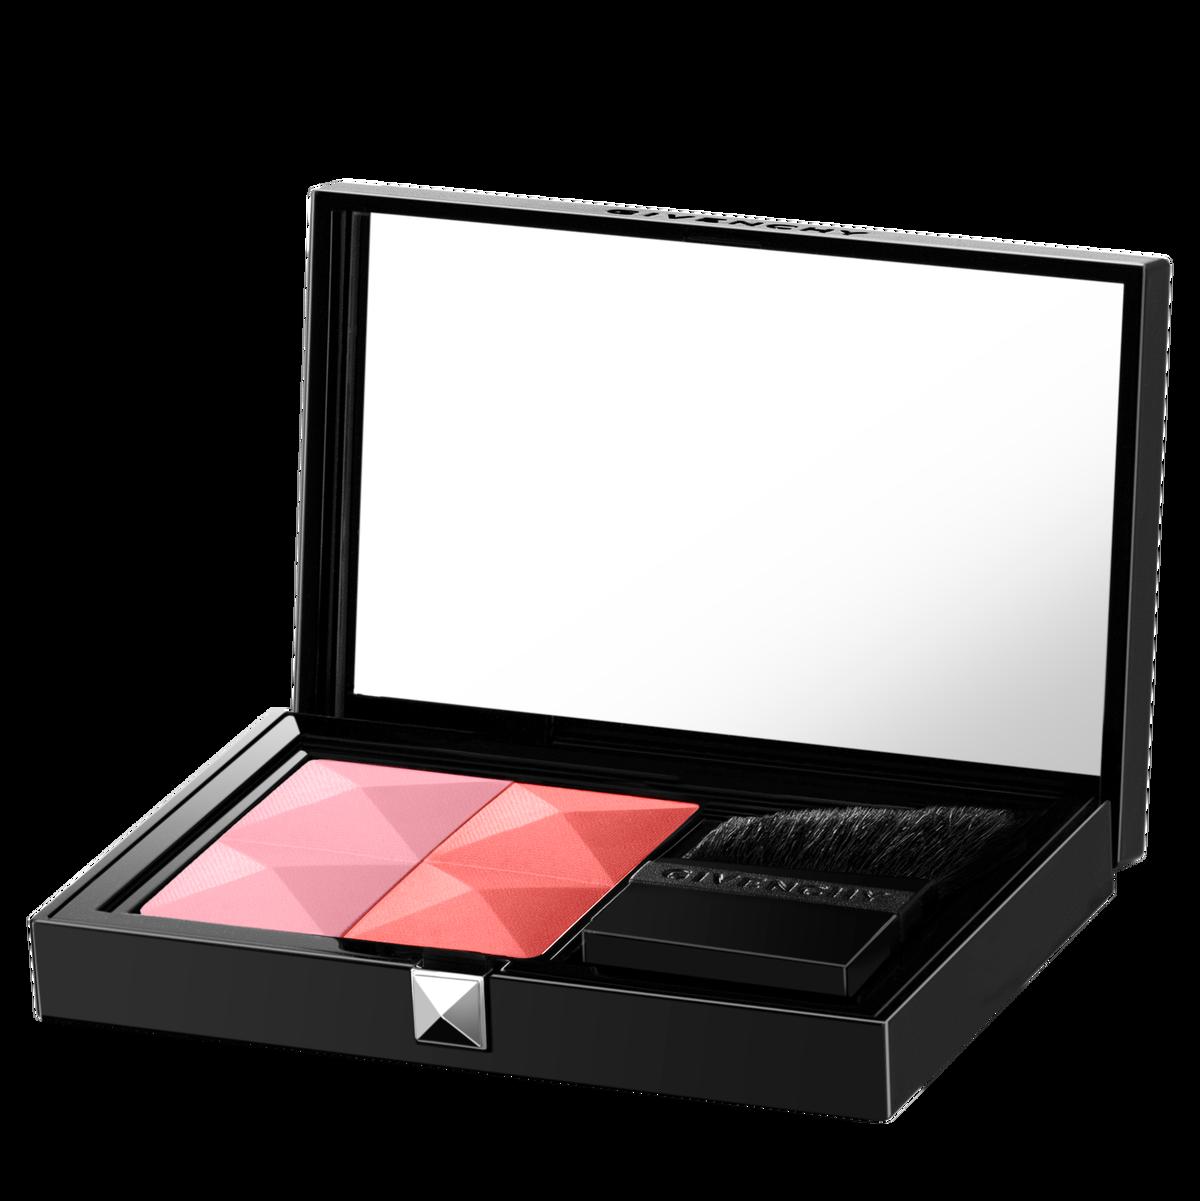 Givenchy prisme blush отзывы